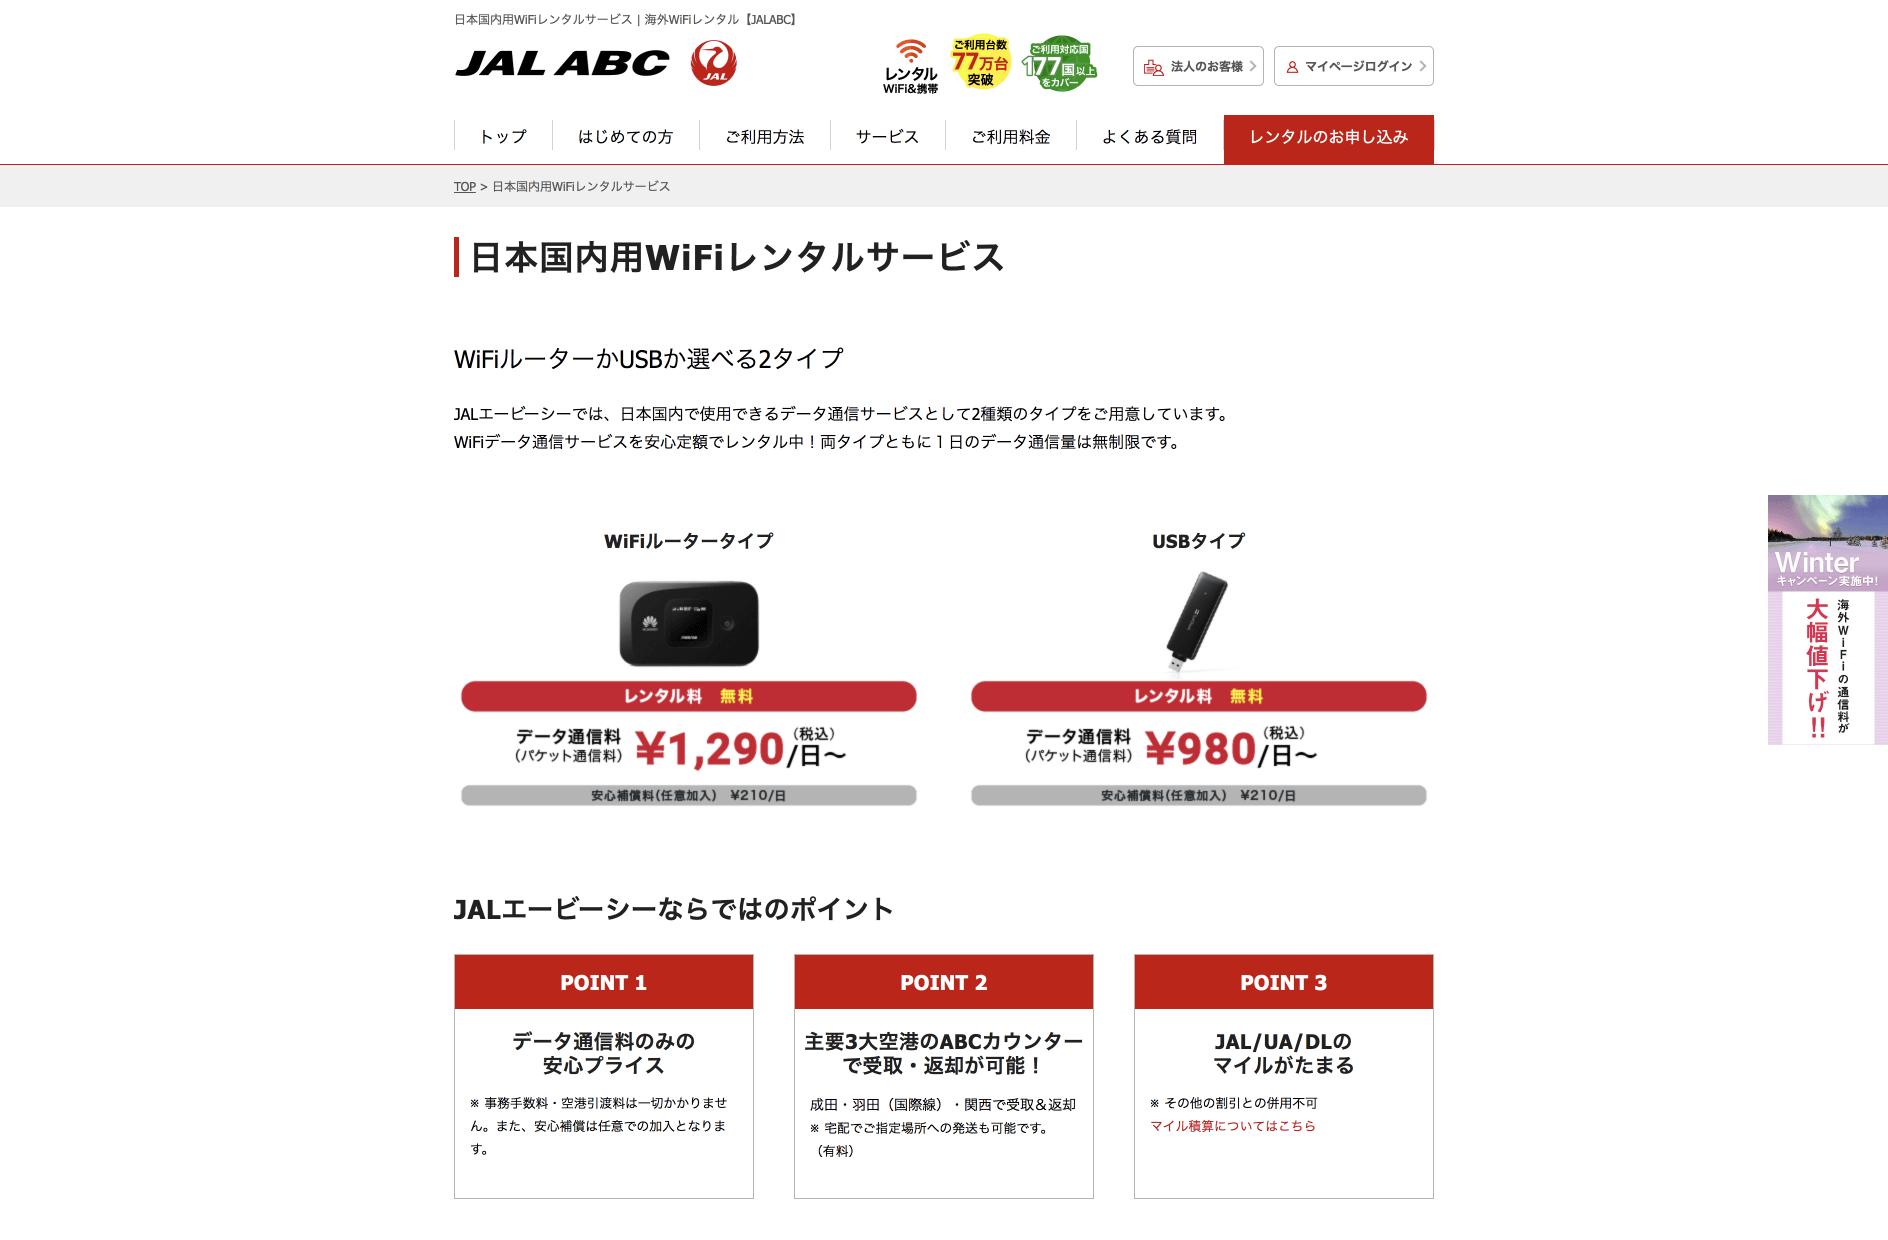 Compared: Pocket WiFi Rental Options at Narita Airport [2019]